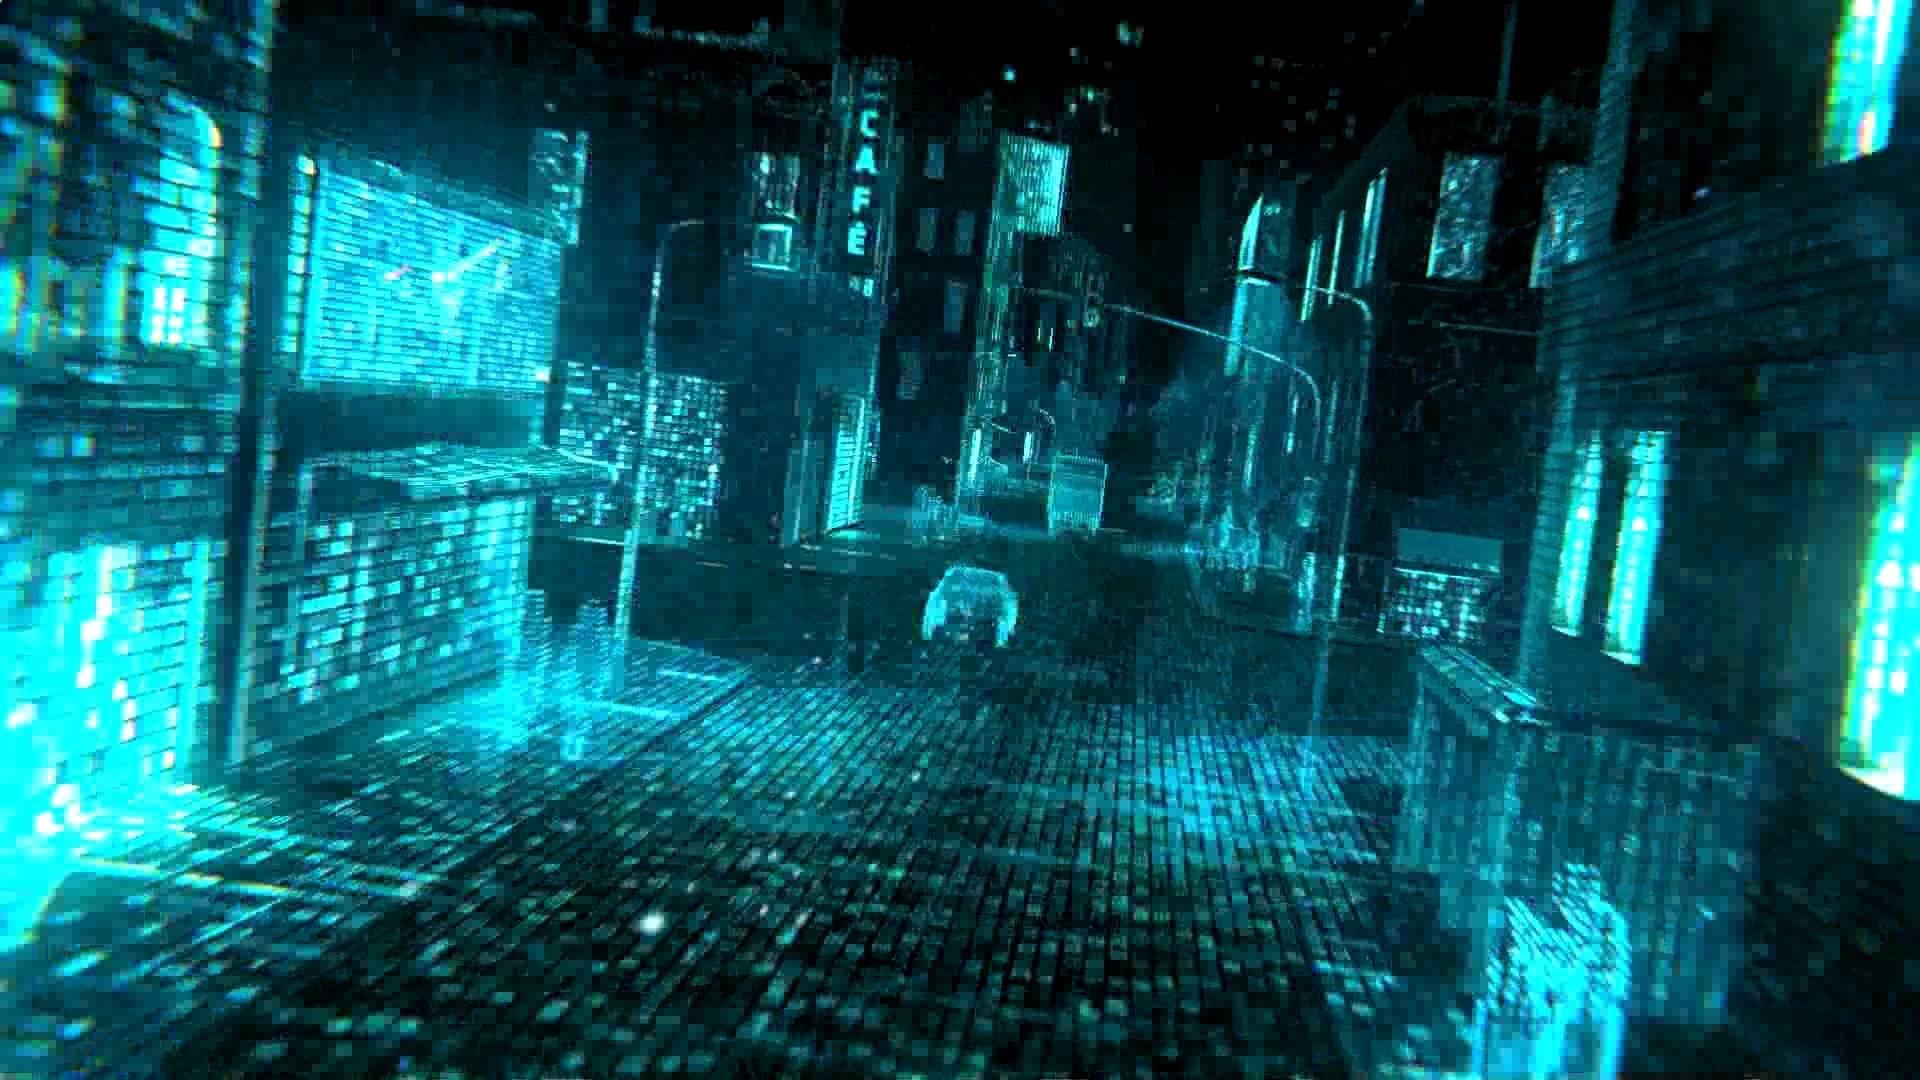 Binary-Code-1920%C3%971080-Binary-Code-Adorable-Wallpa-wallpaper-wp3603337